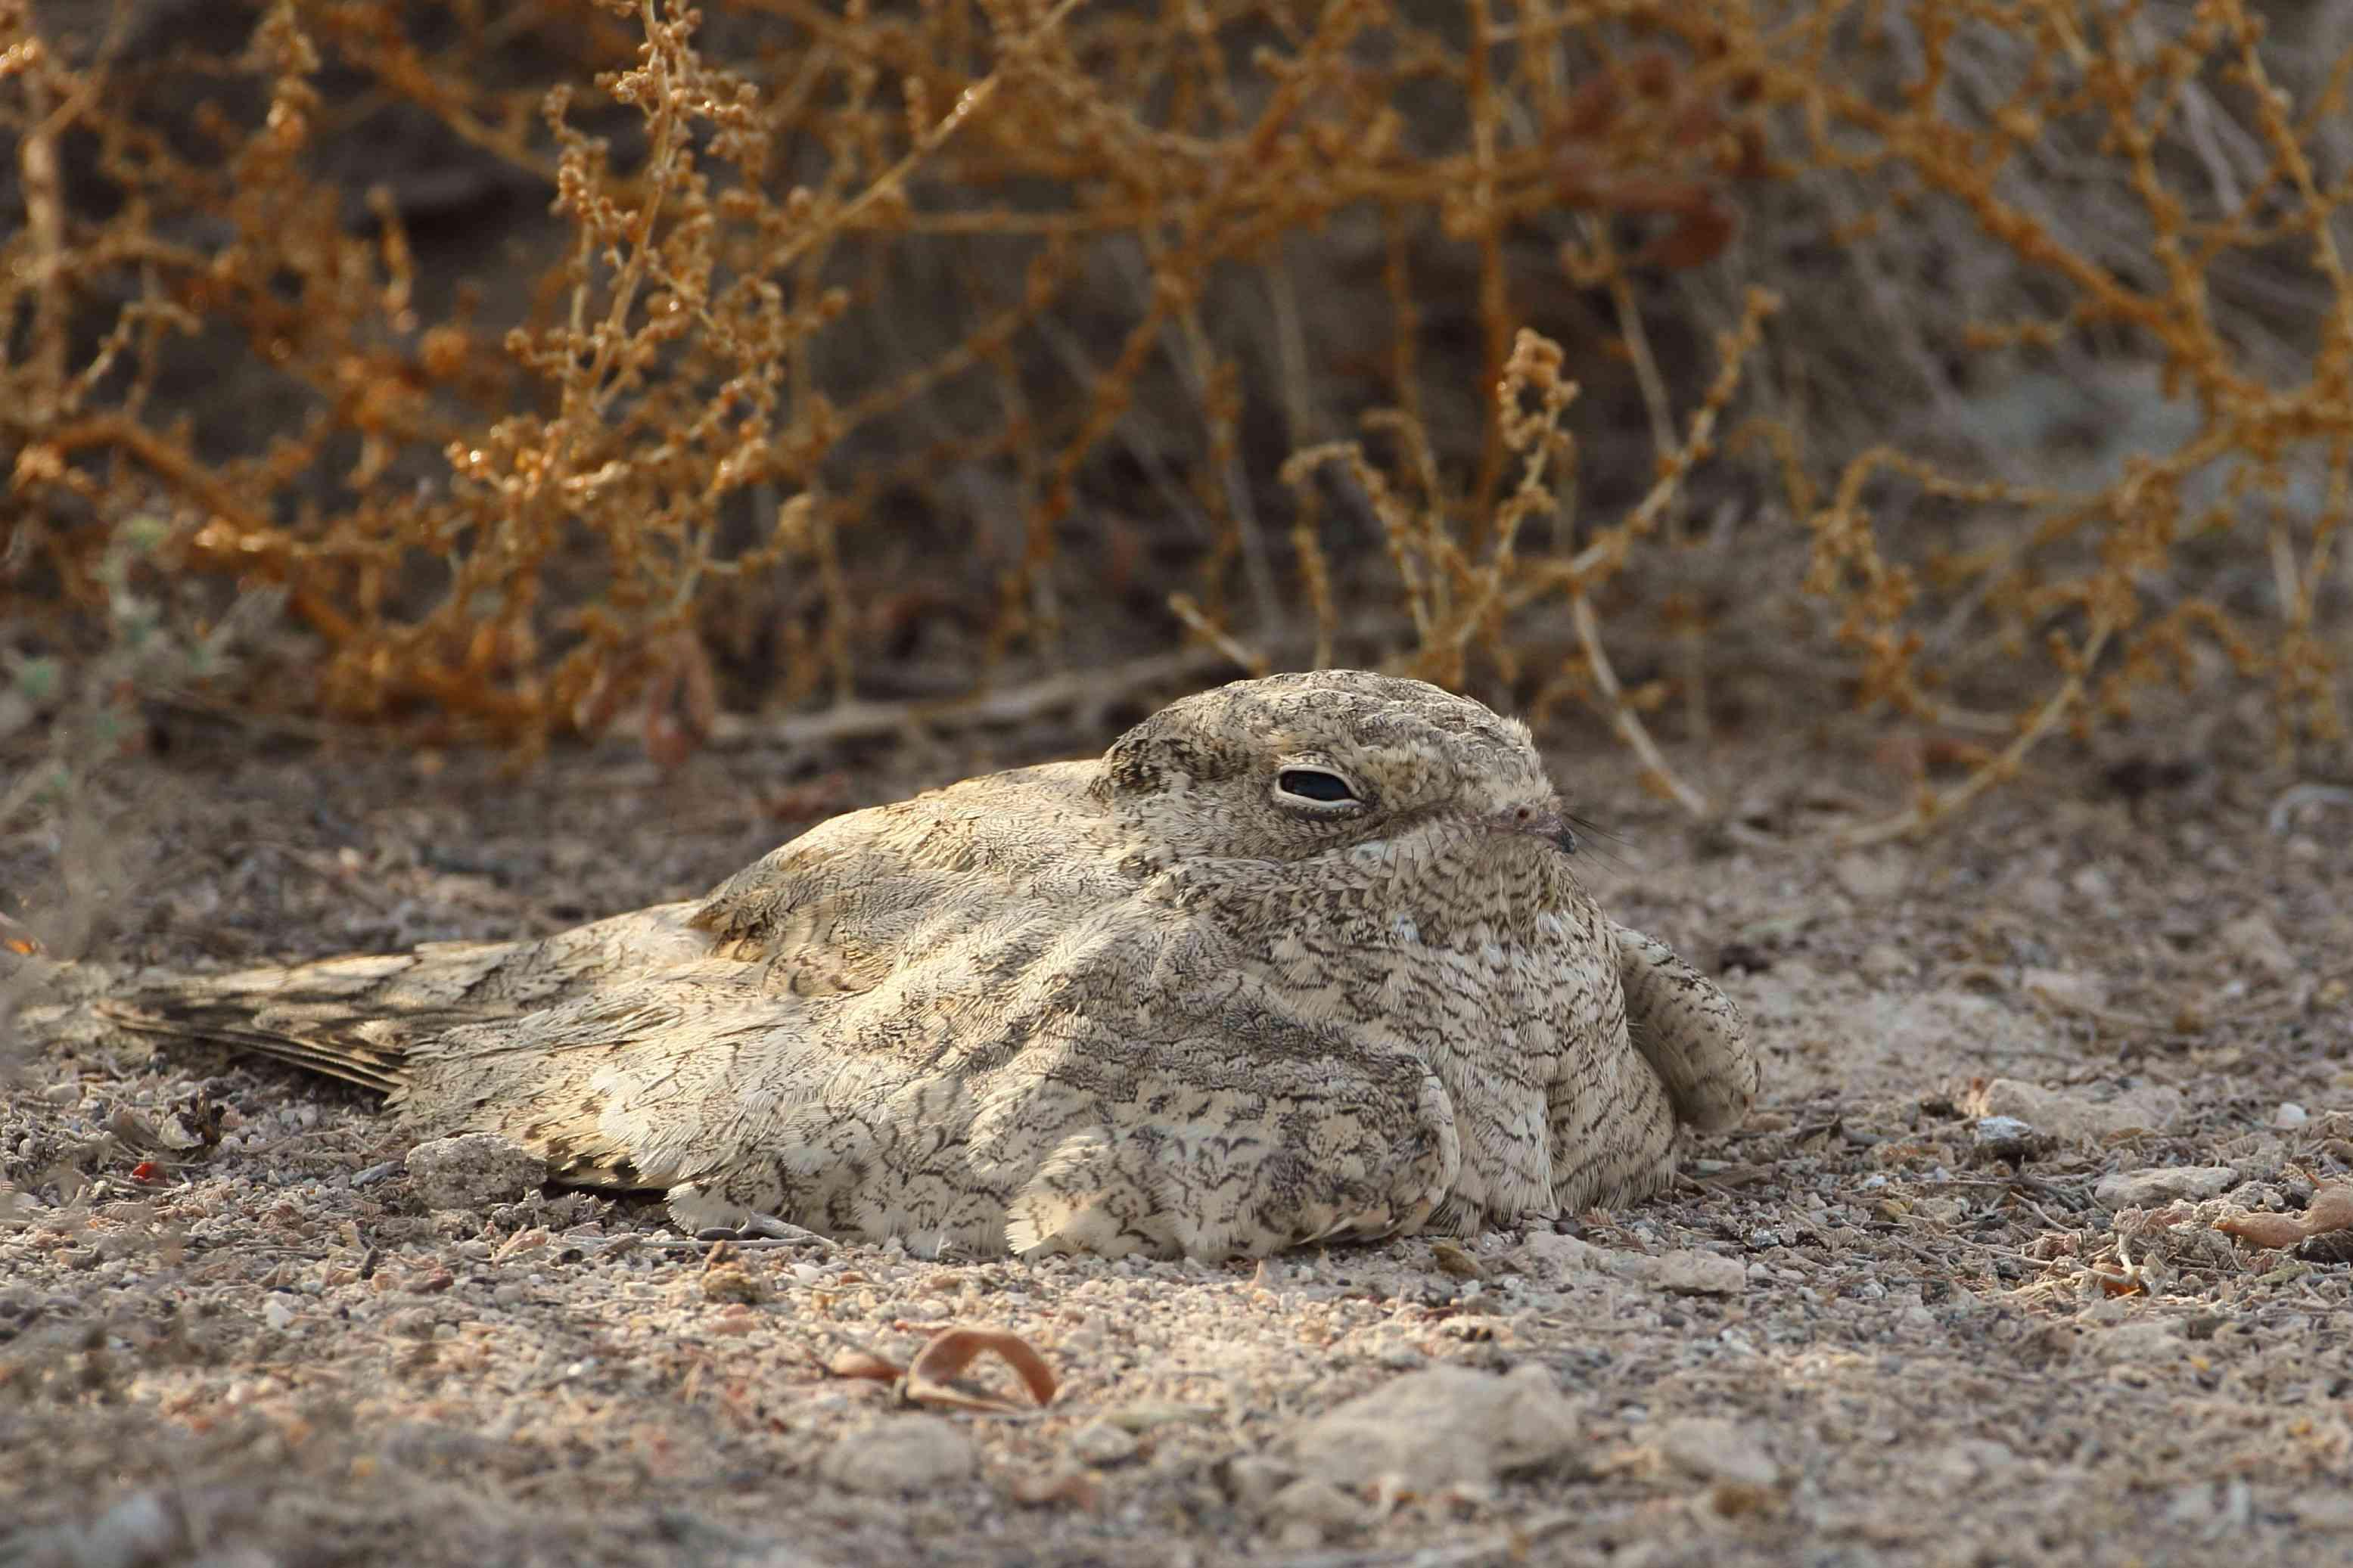 tan nightjar bird sits on sandy ground and looks away